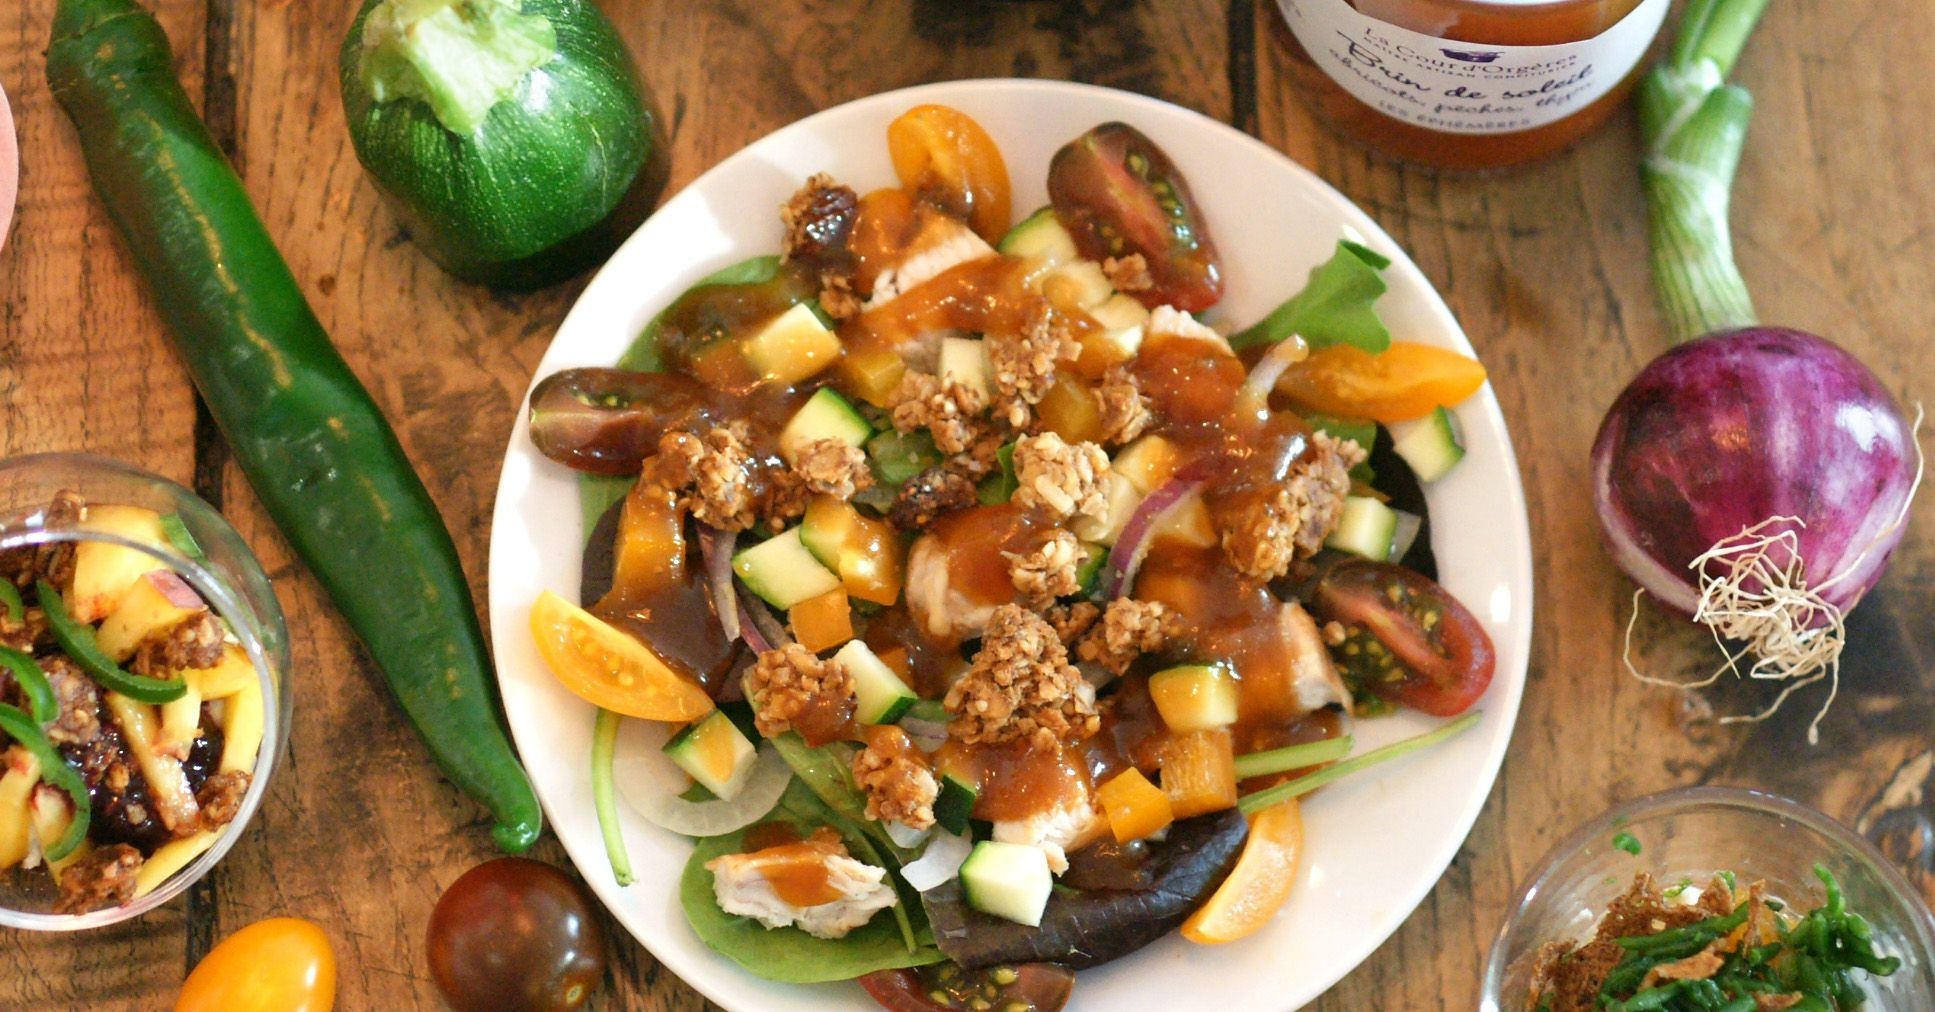 salade vinaigrette brin de soleil